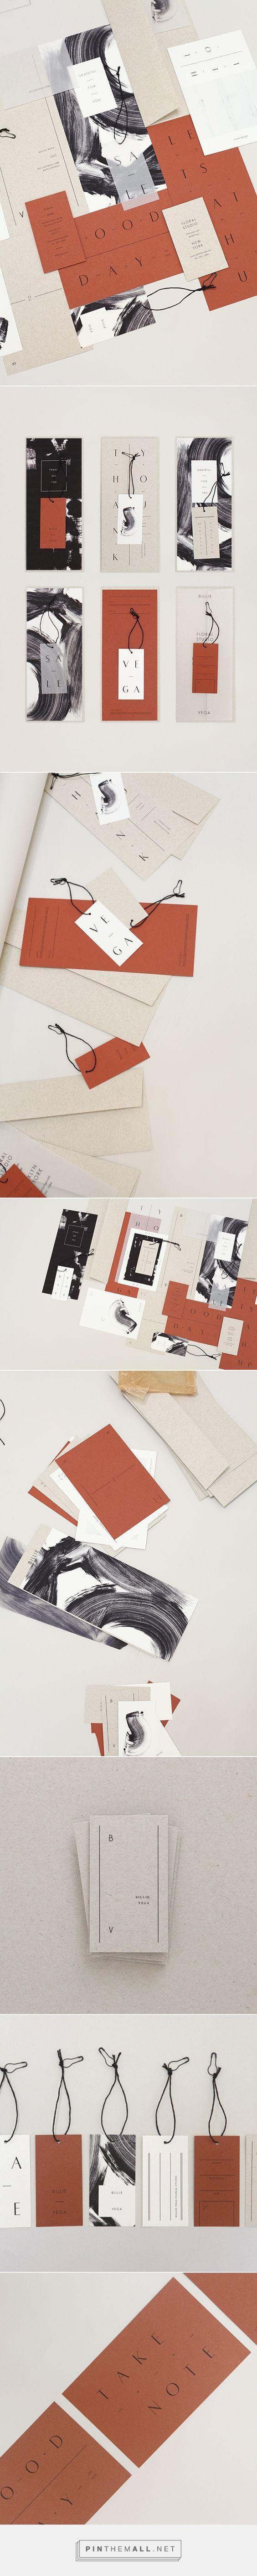 Billie Collection by Hands-on | Logo Designer Bradenton, Web Design Sarasota, Tampa Fivestar Branding Agency